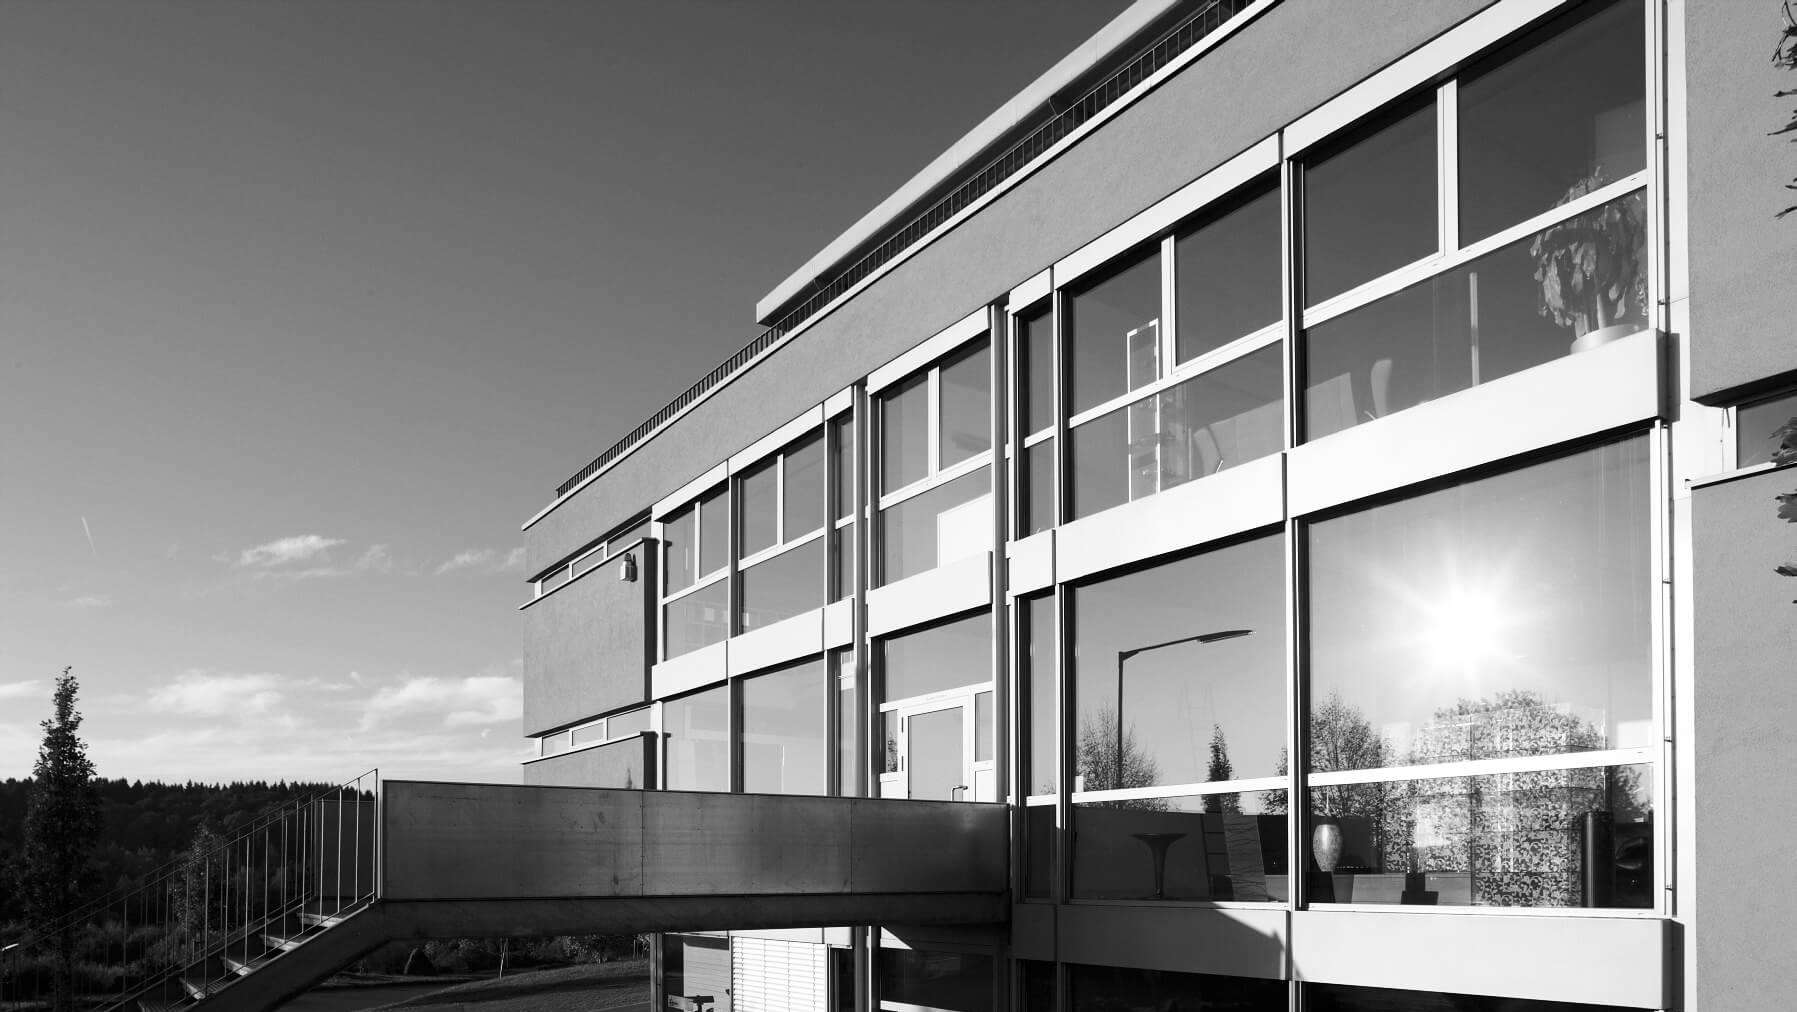 schmalenbach headquarters in gummersbach germany